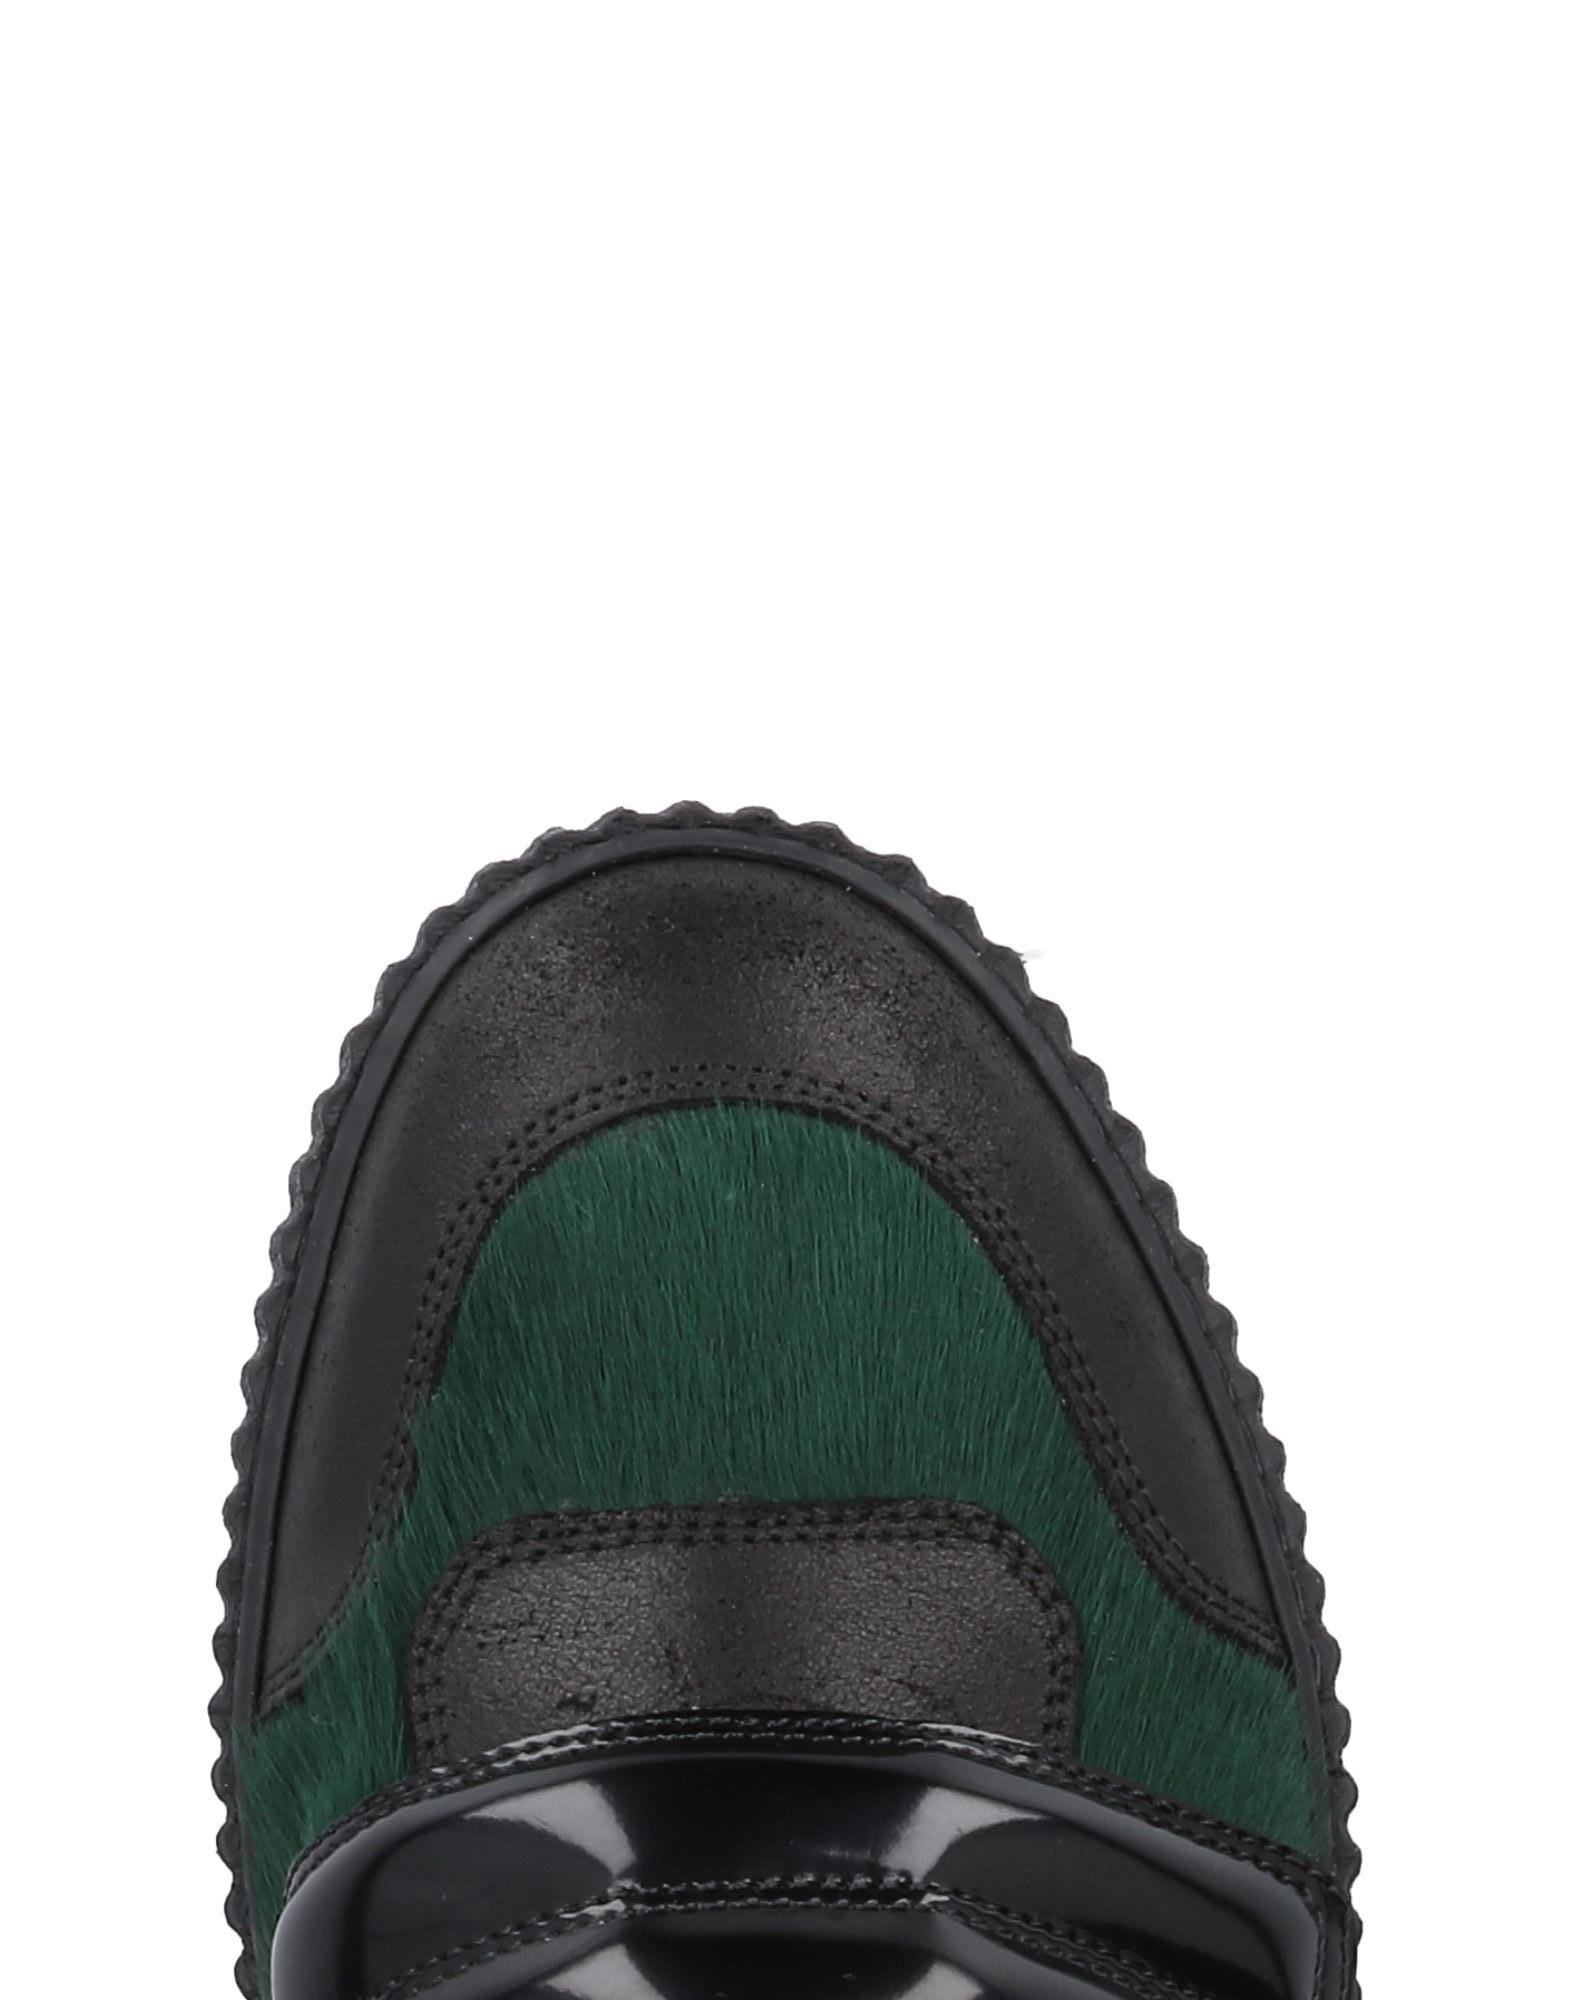 Mm6 Maison Margiela Sneakers Damen  11469493TCGut 11469493TCGut 11469493TCGut aussehende strapazierfähige Schuhe 009308